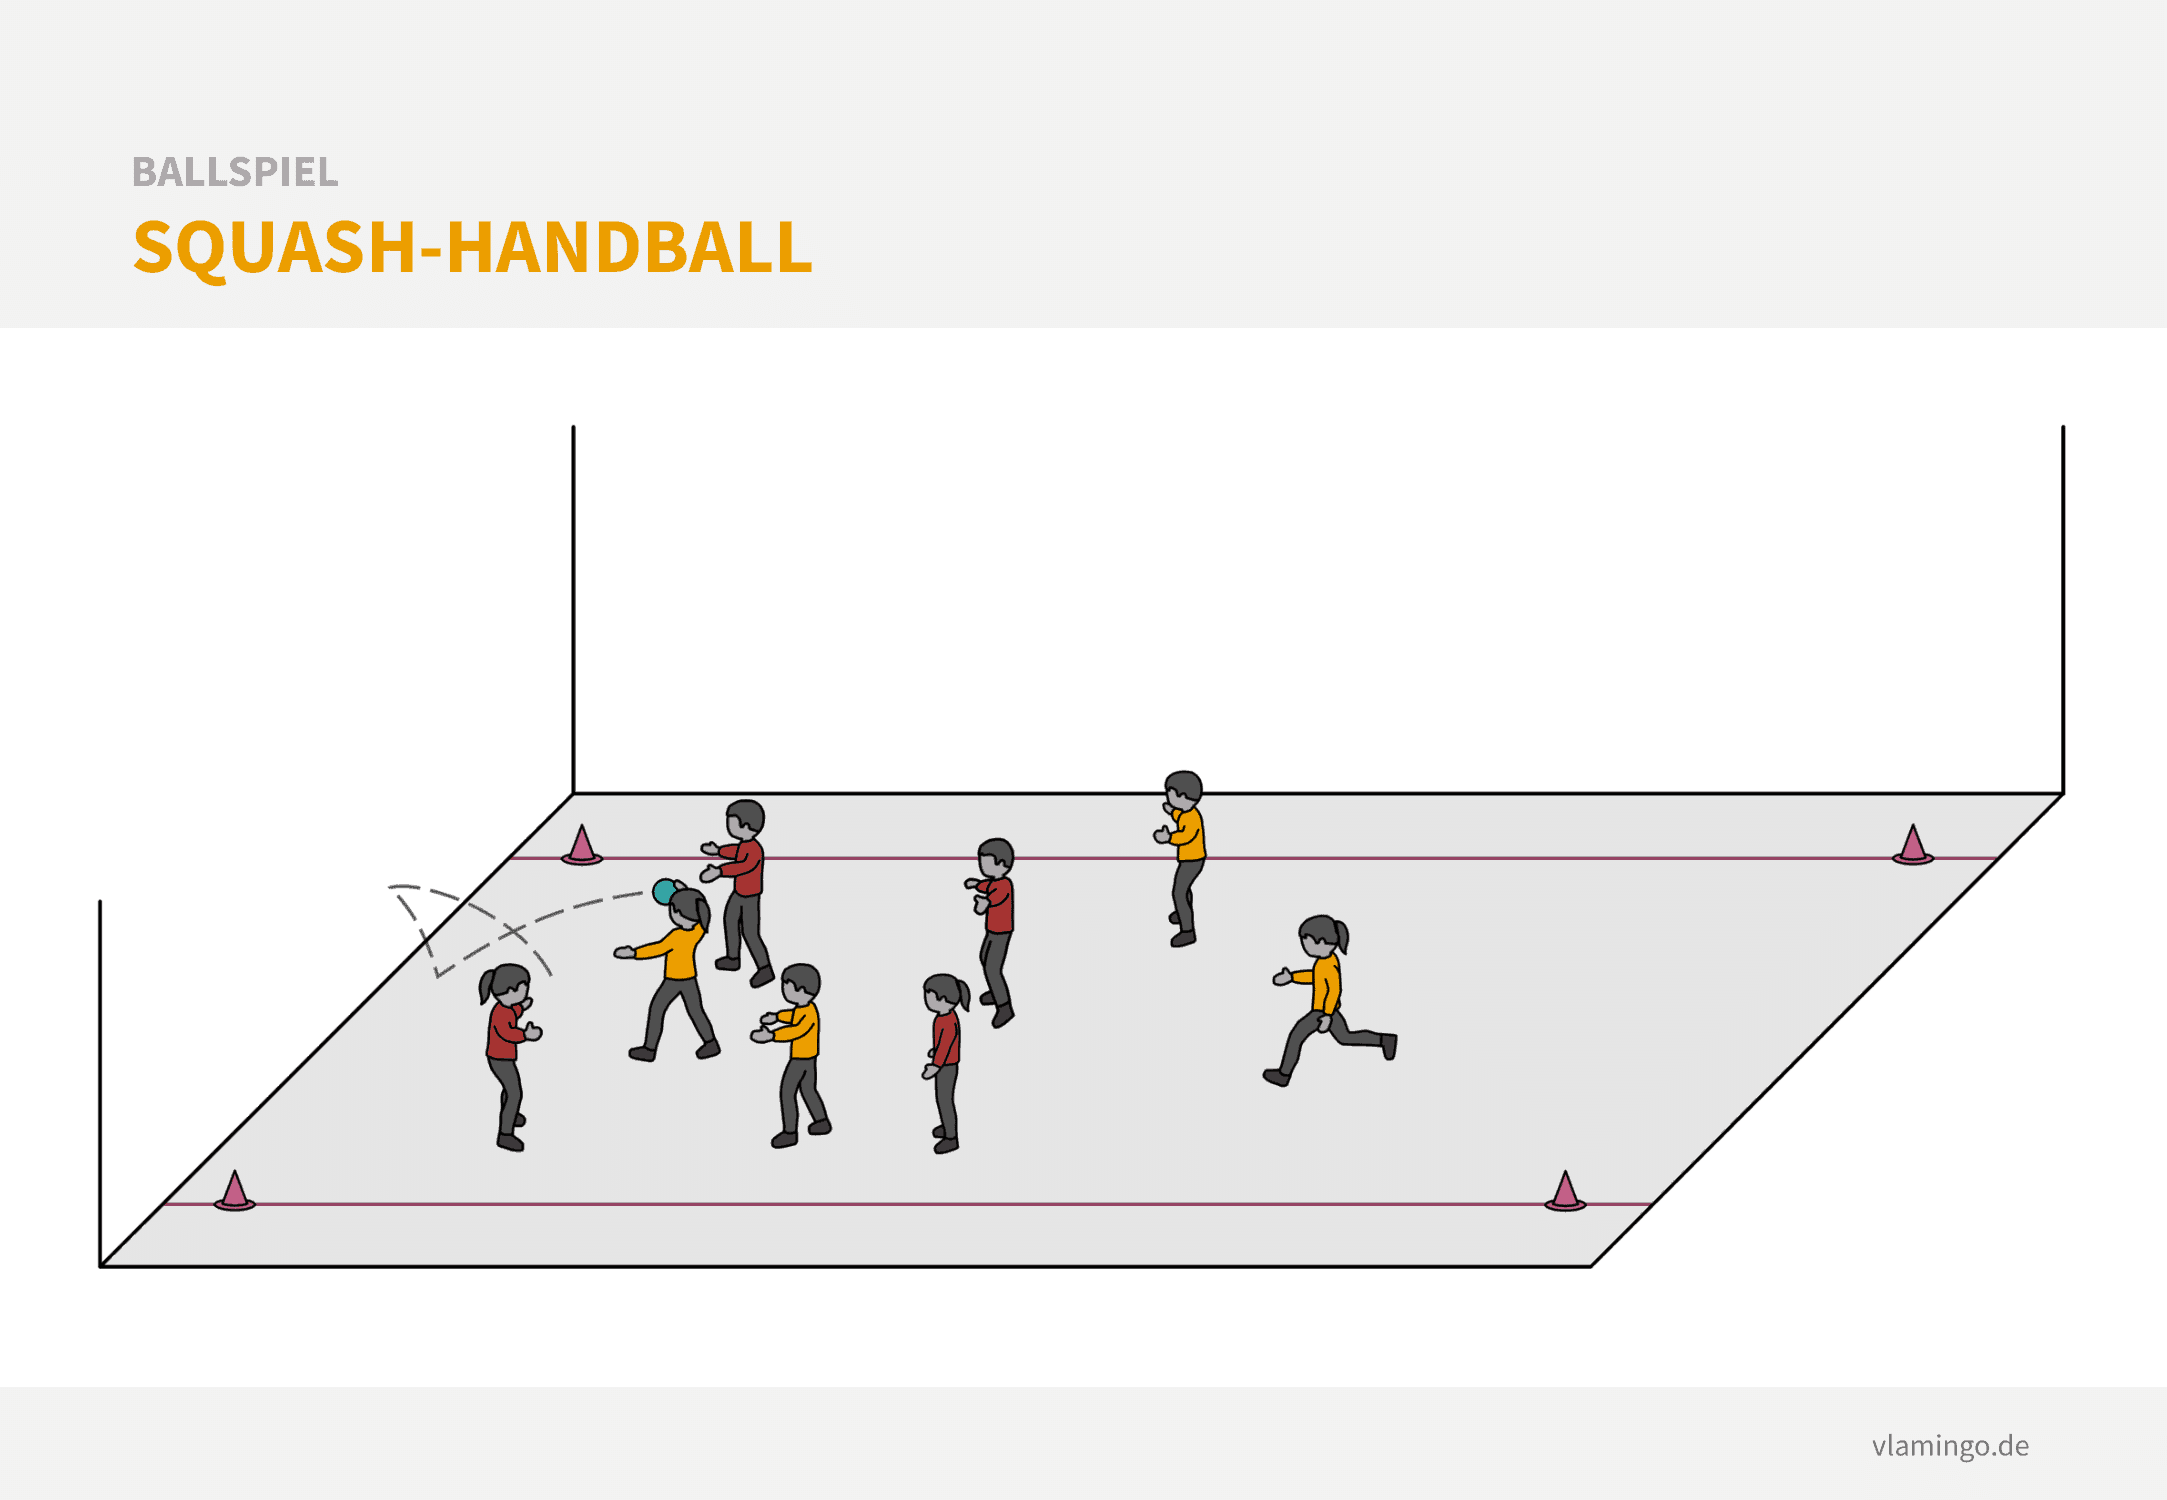 Ballspiel: Squash-Handball